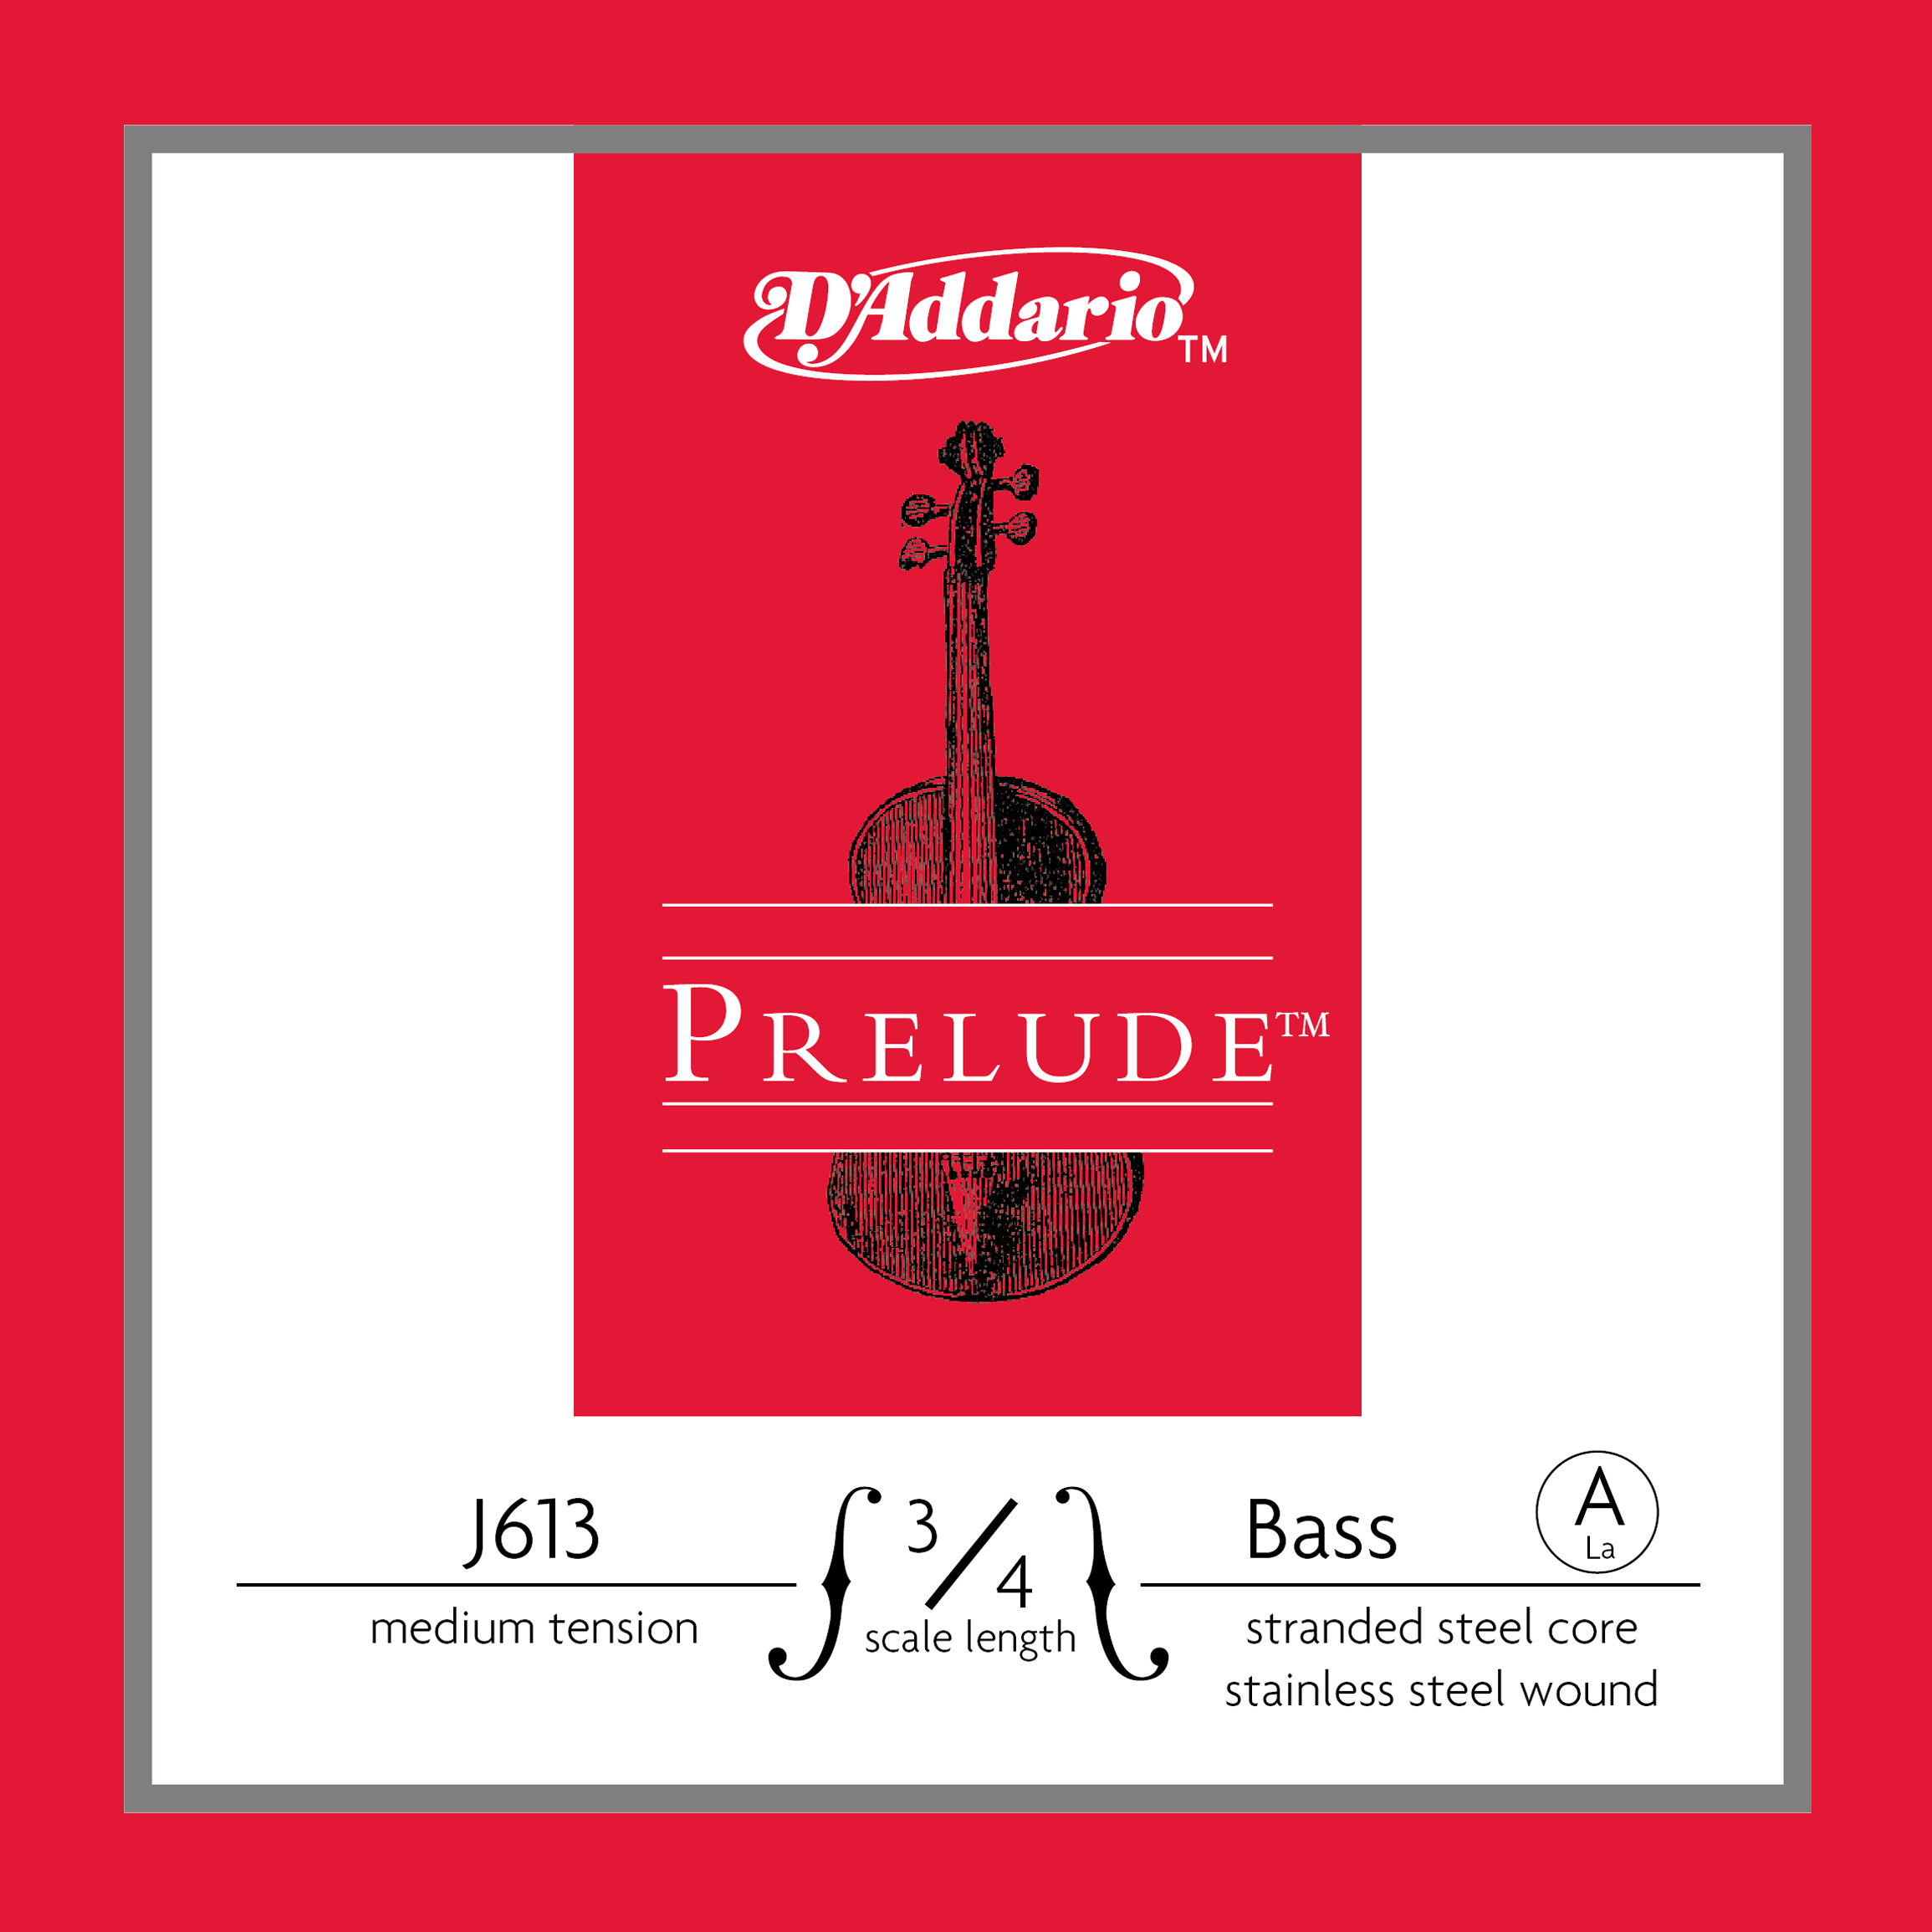 D'Addario Prelude Bass Single A String, 3/4 Scale, Medium Tension